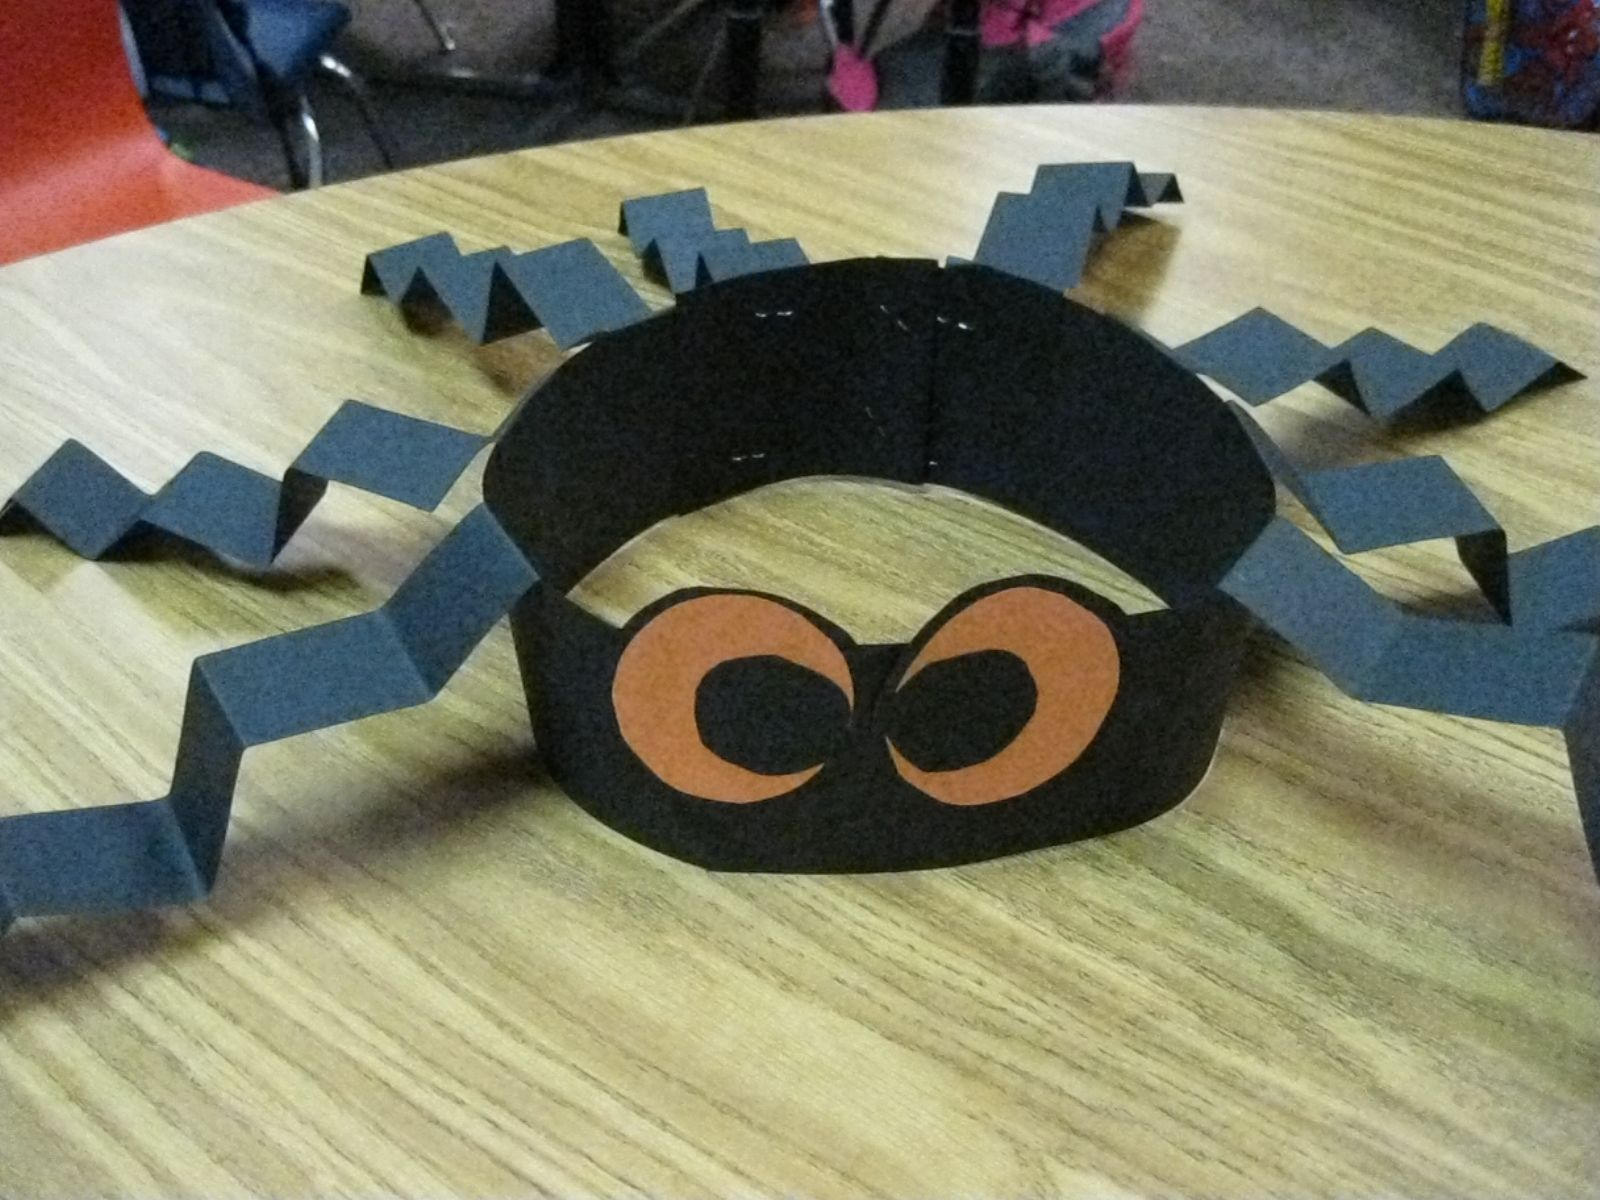 Spider hat craft crafts pinterest spider craft and for Spider crafts for preschoolers